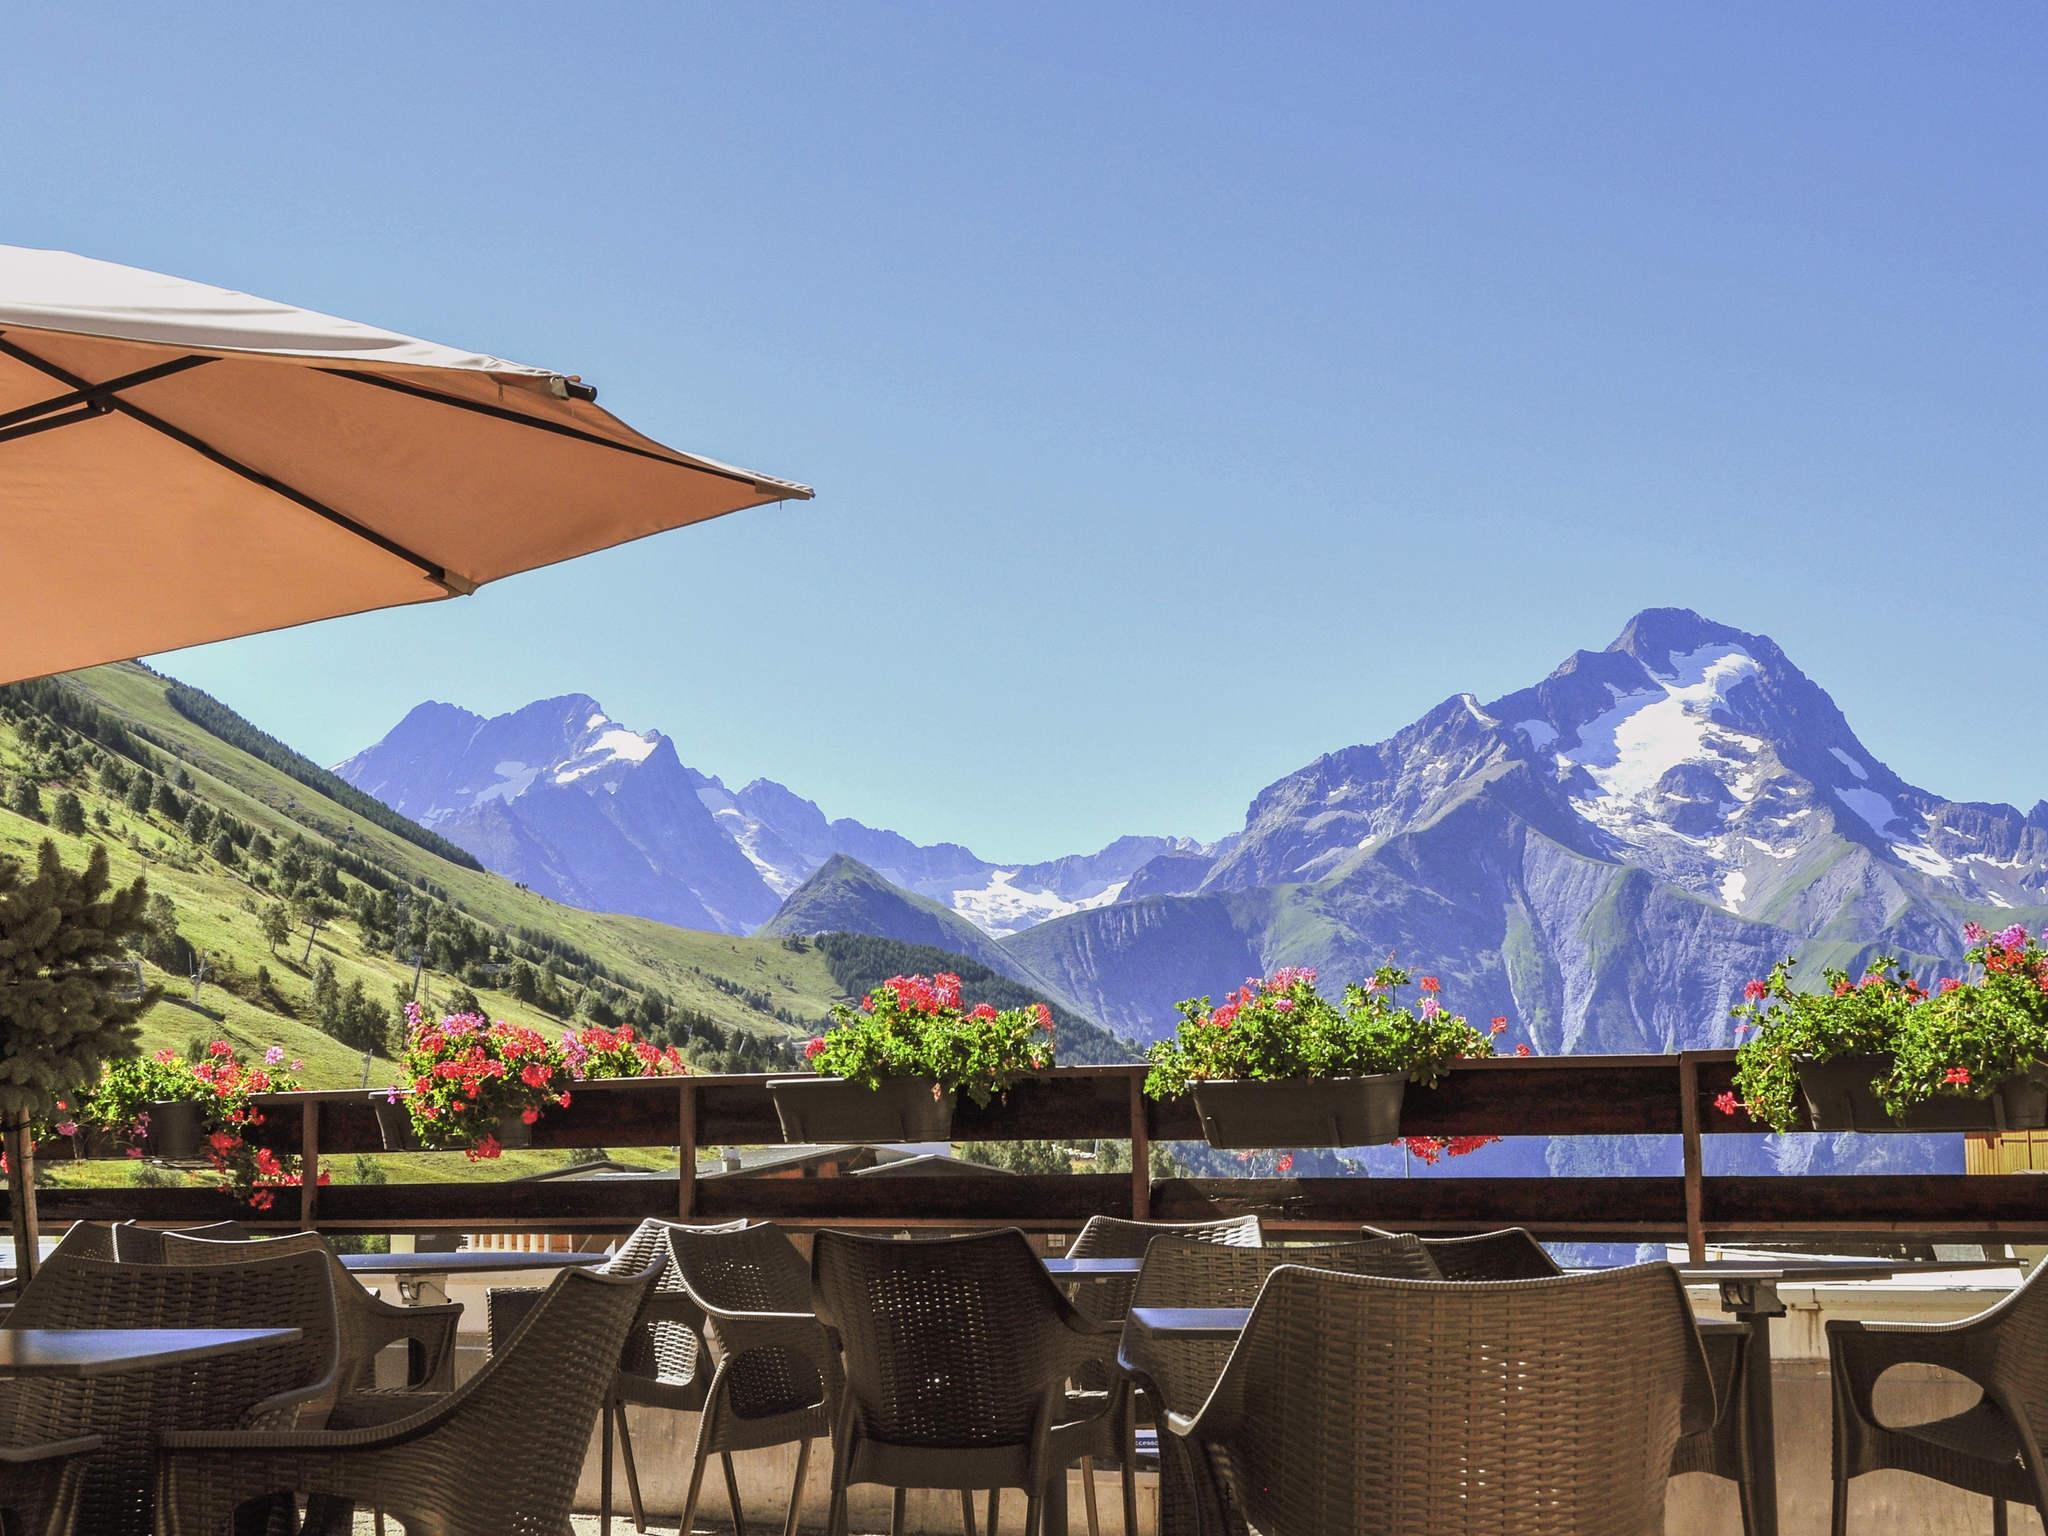 Hotel in les deux alpes mercure les deux alpes 1800 hotel for Hotels 2 alpes